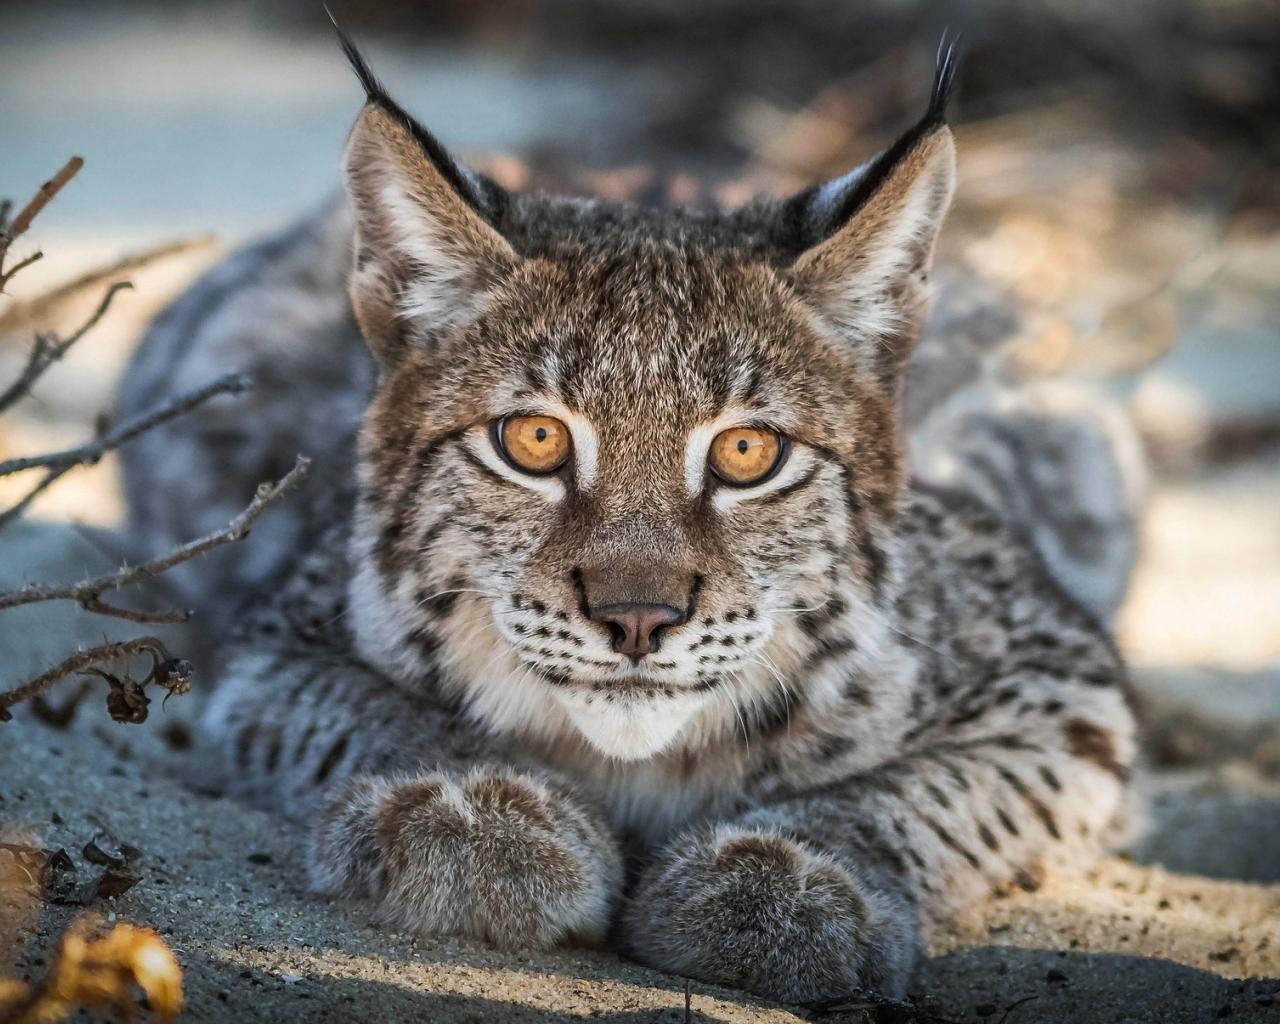 Close up, Lynx, cat, predator, muzzle, 1280x1024 wallpaper